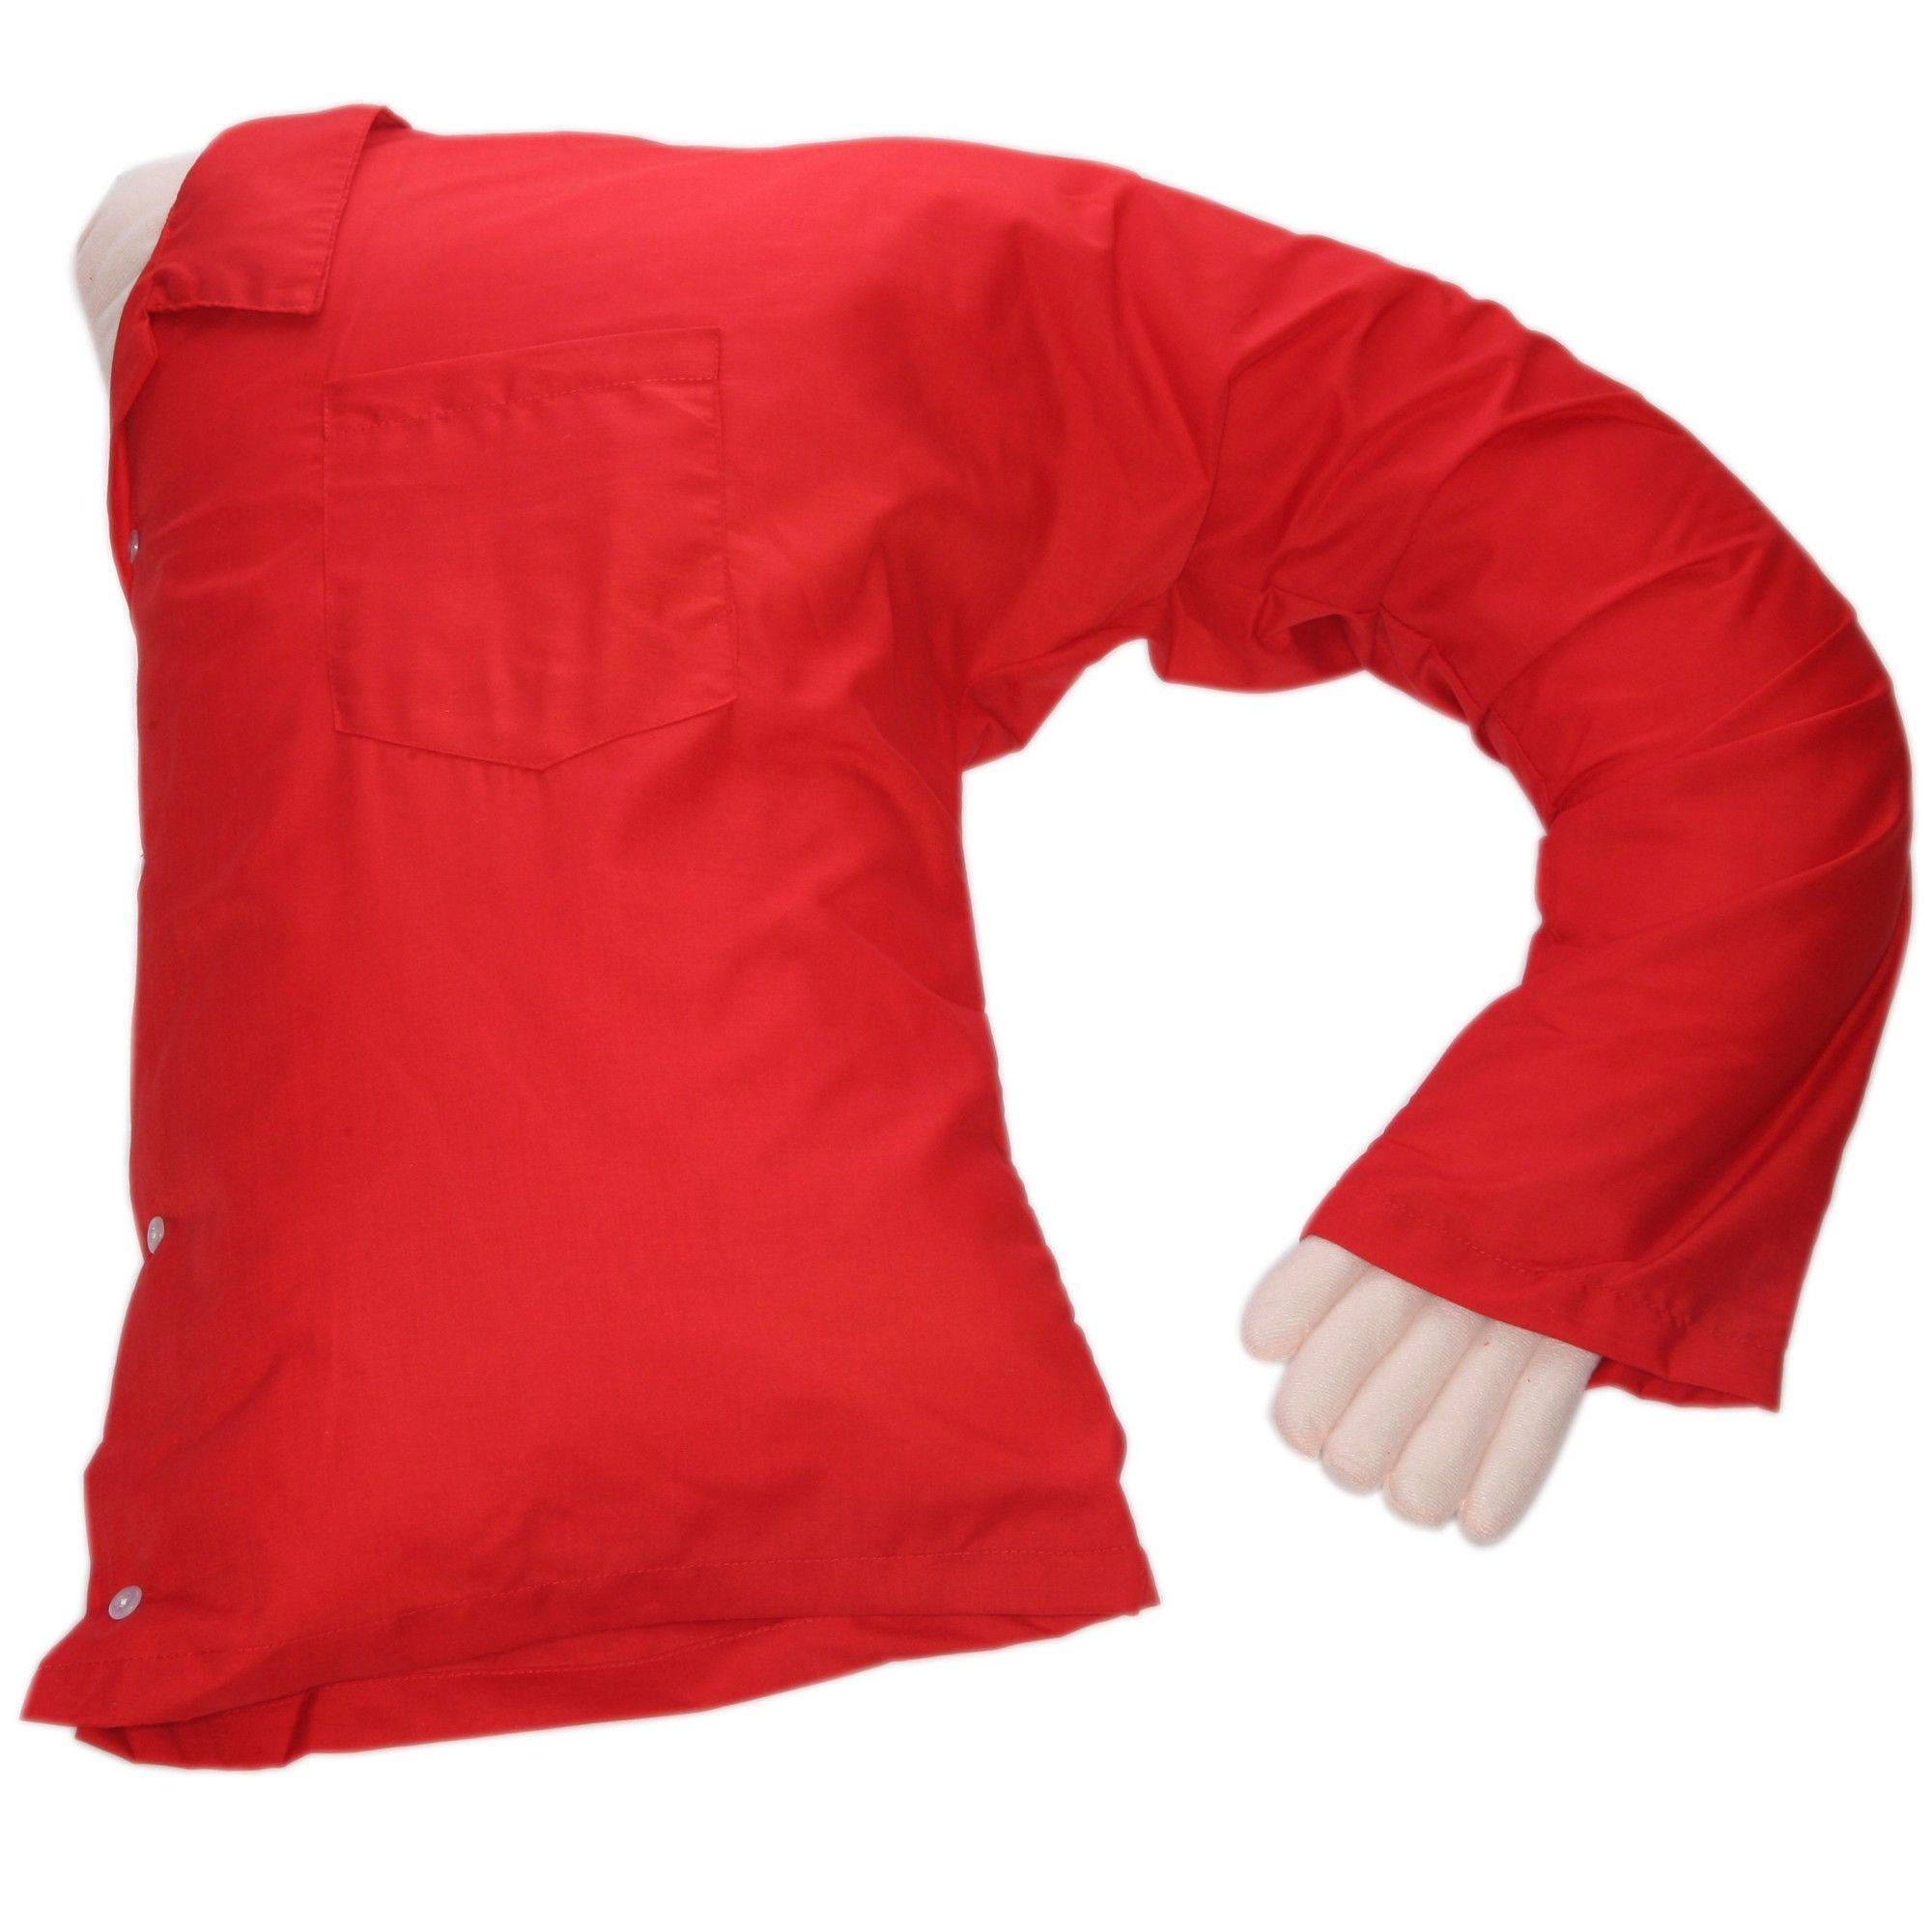 Boyfriend Body Cotton Bed Rest Pillow Boyfriend pillow